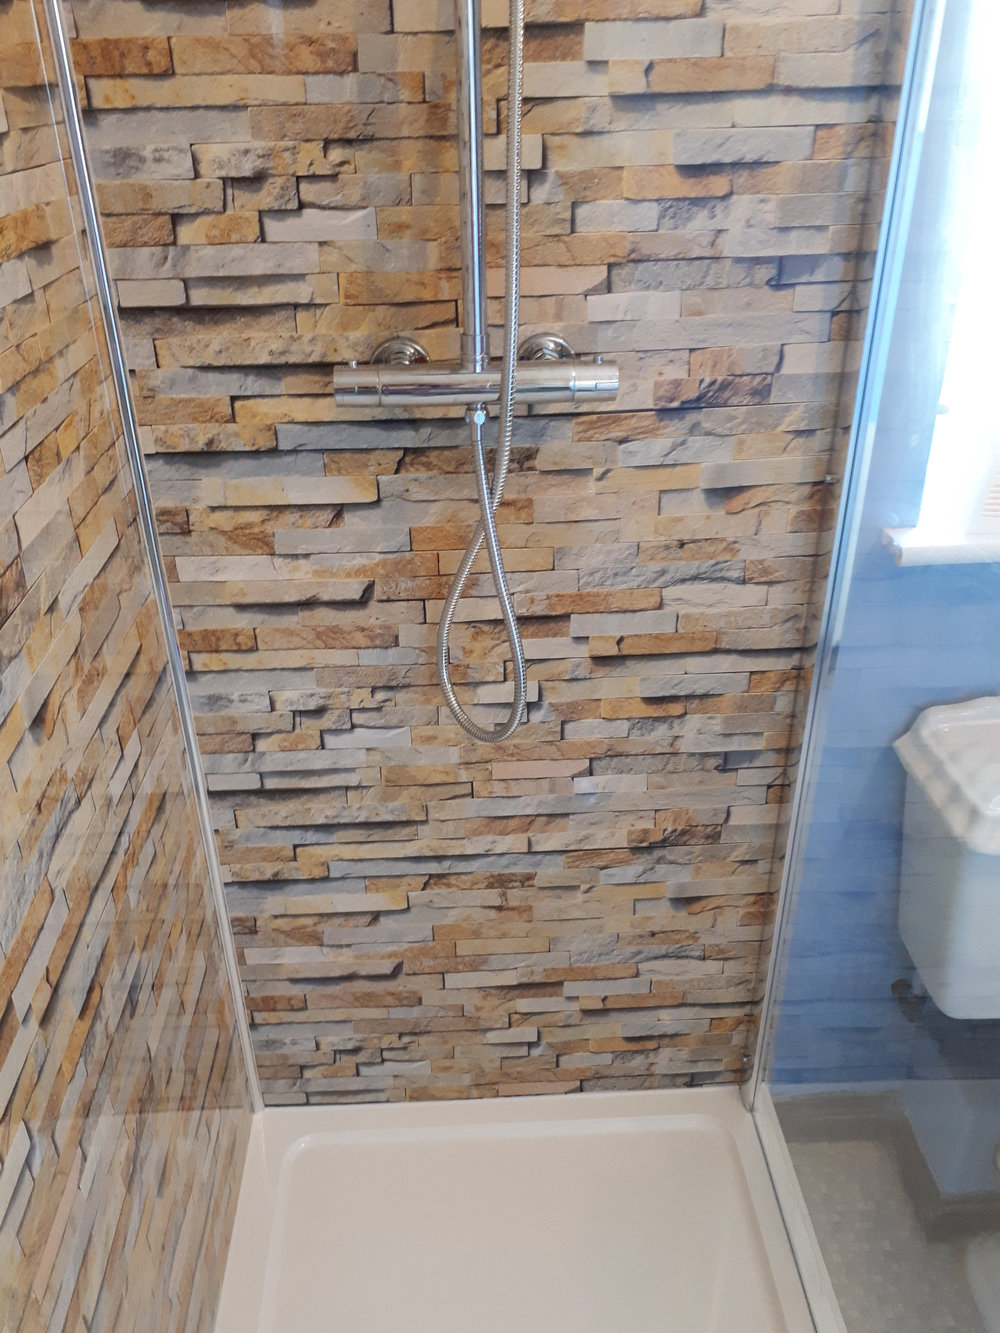 Projects Paul Drew Plumbing And Tiling - Aquaboard shower panels